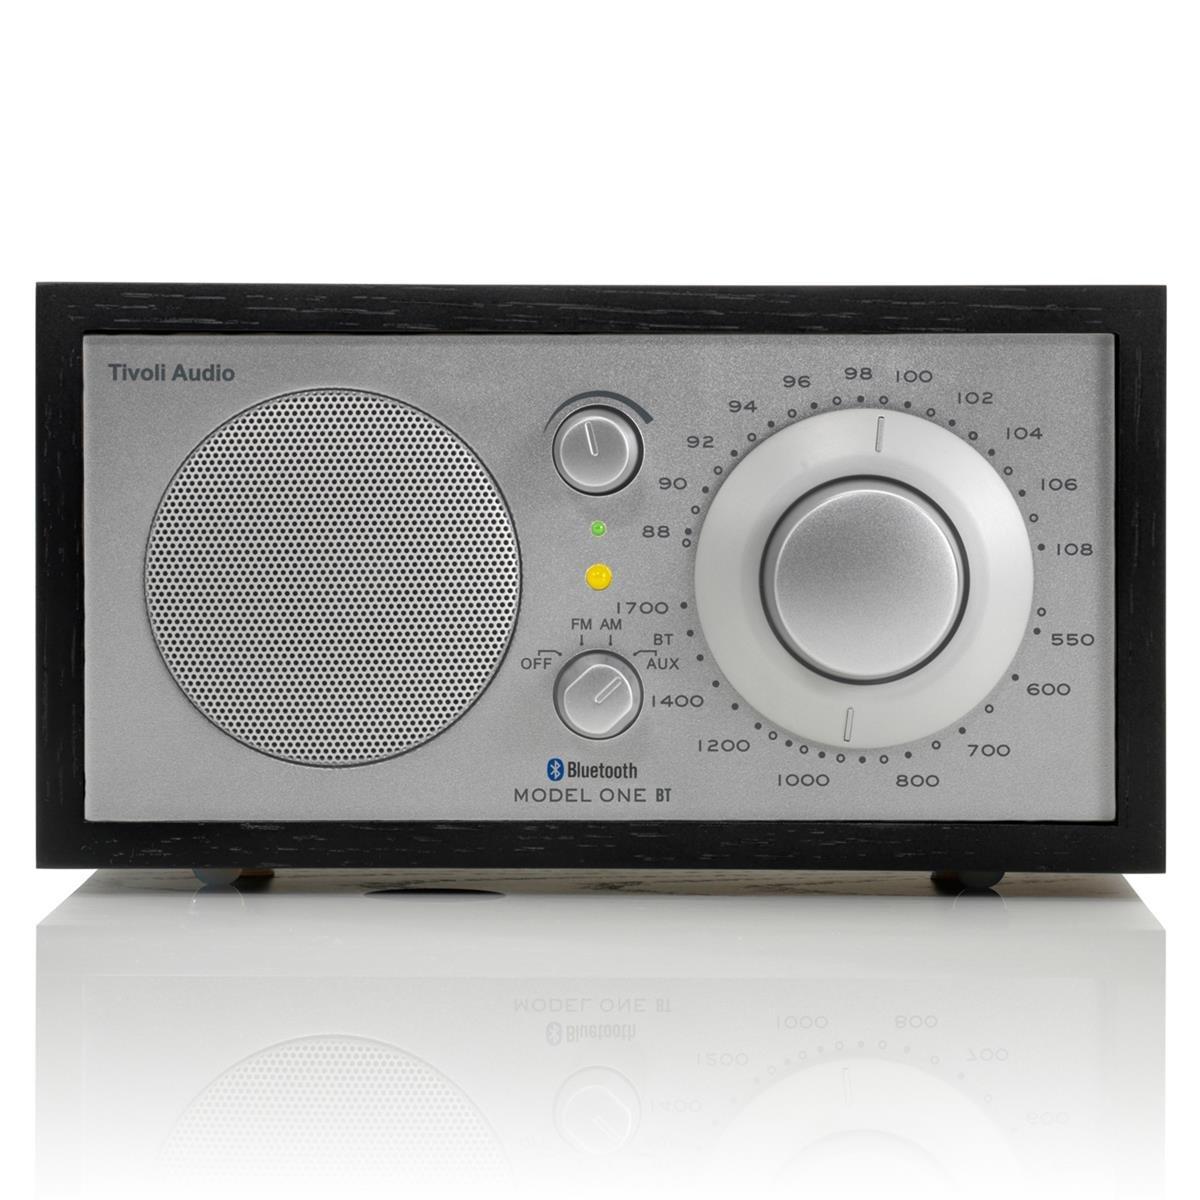 Tivoli Audio M1BTSLB Model One BT Bluetooth AM/FM Radio (Black Ash/Silver) by Tivoli Audio